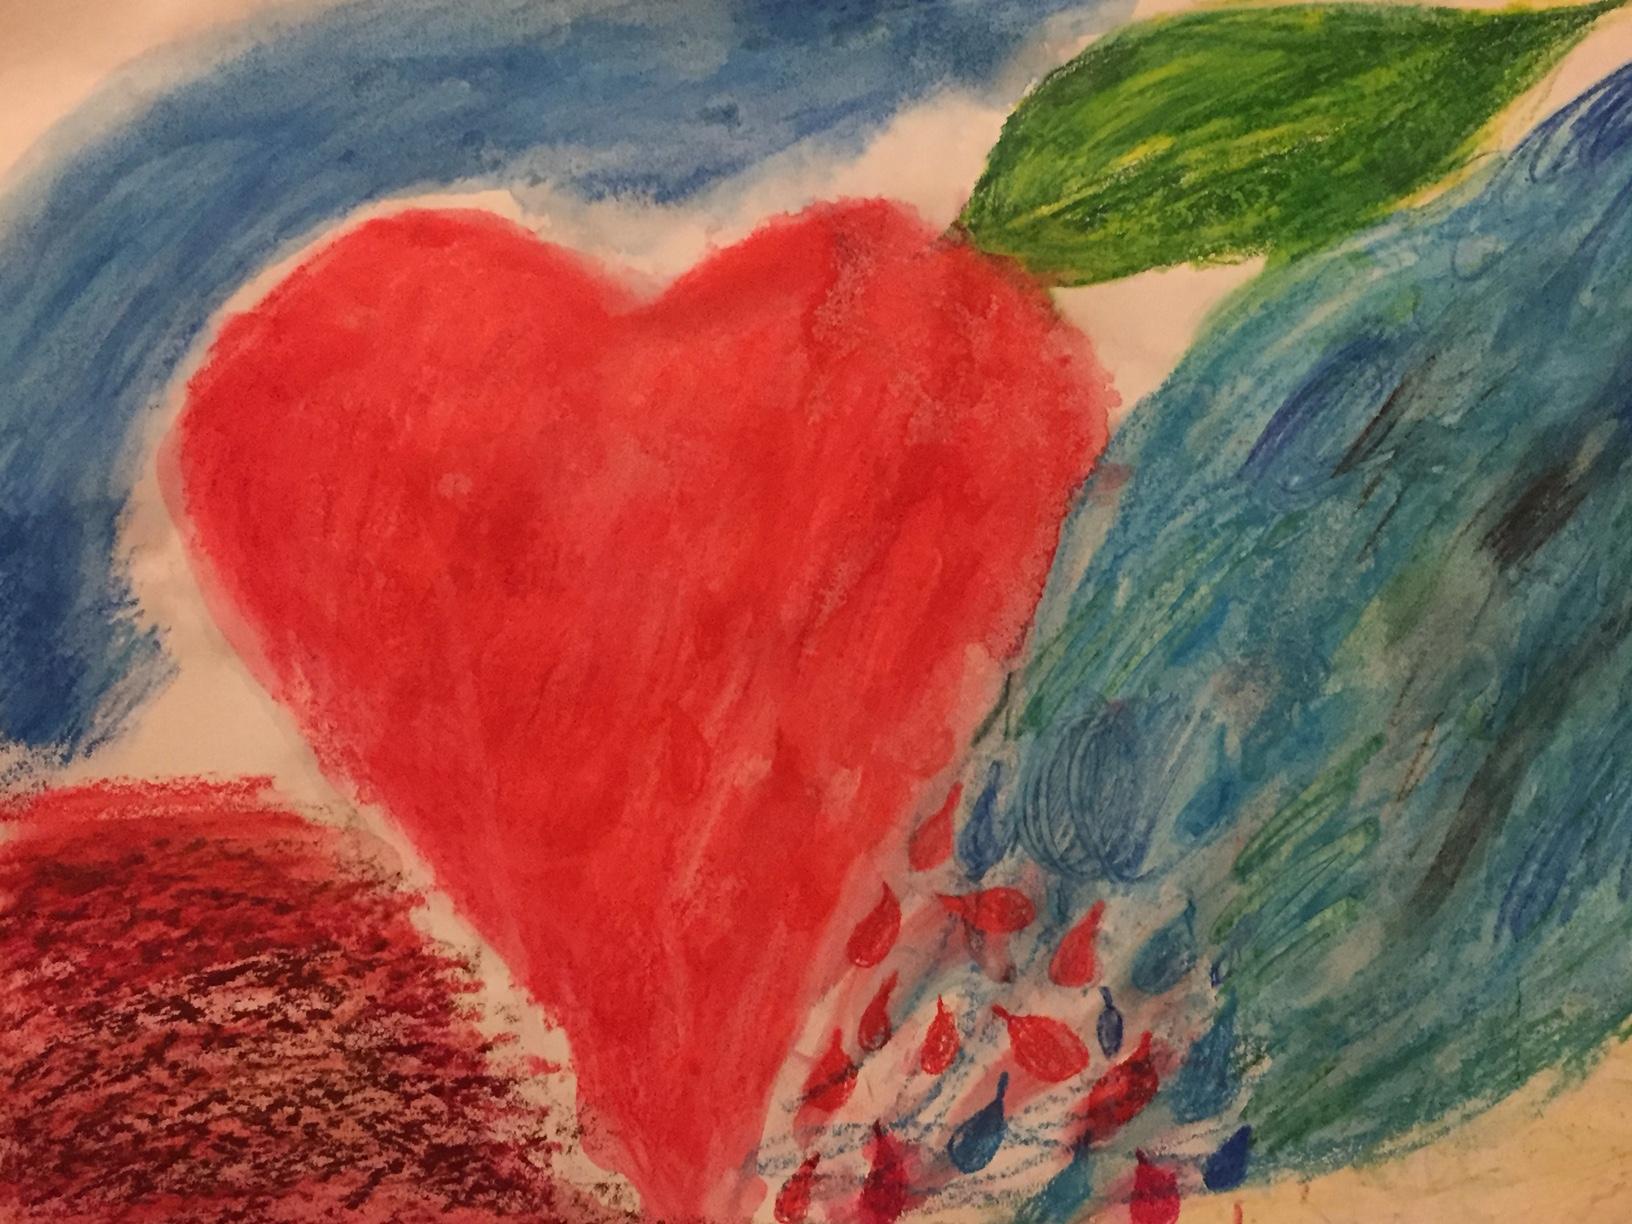 Heart of blood and tears by Anahata Giri